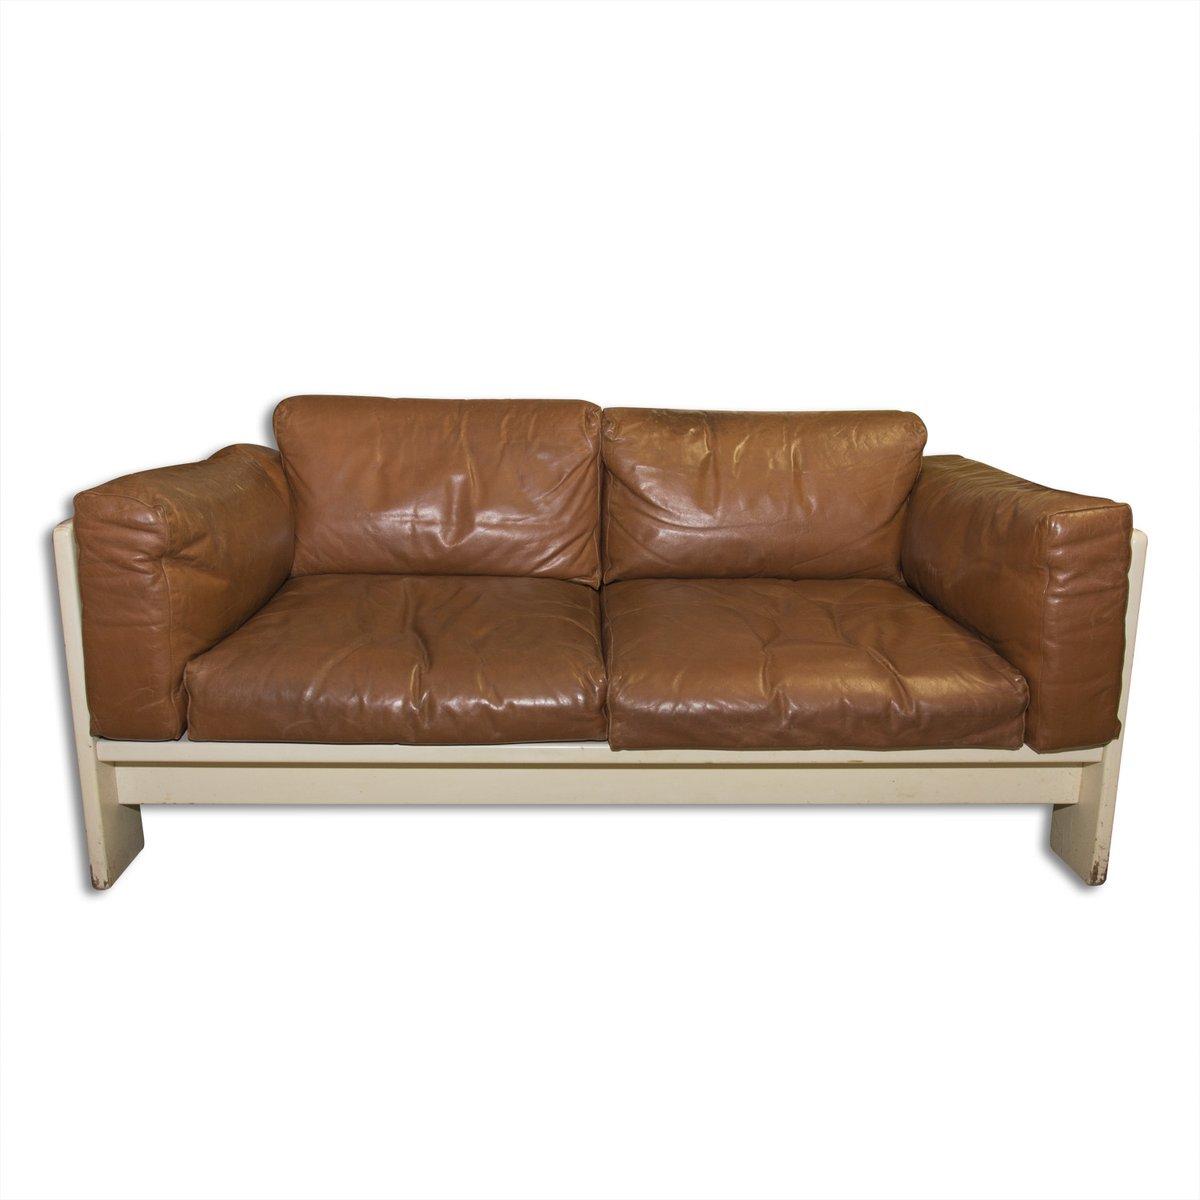 2 sitzer bastiano ledersofa von afra tobia scarpa. Black Bedroom Furniture Sets. Home Design Ideas